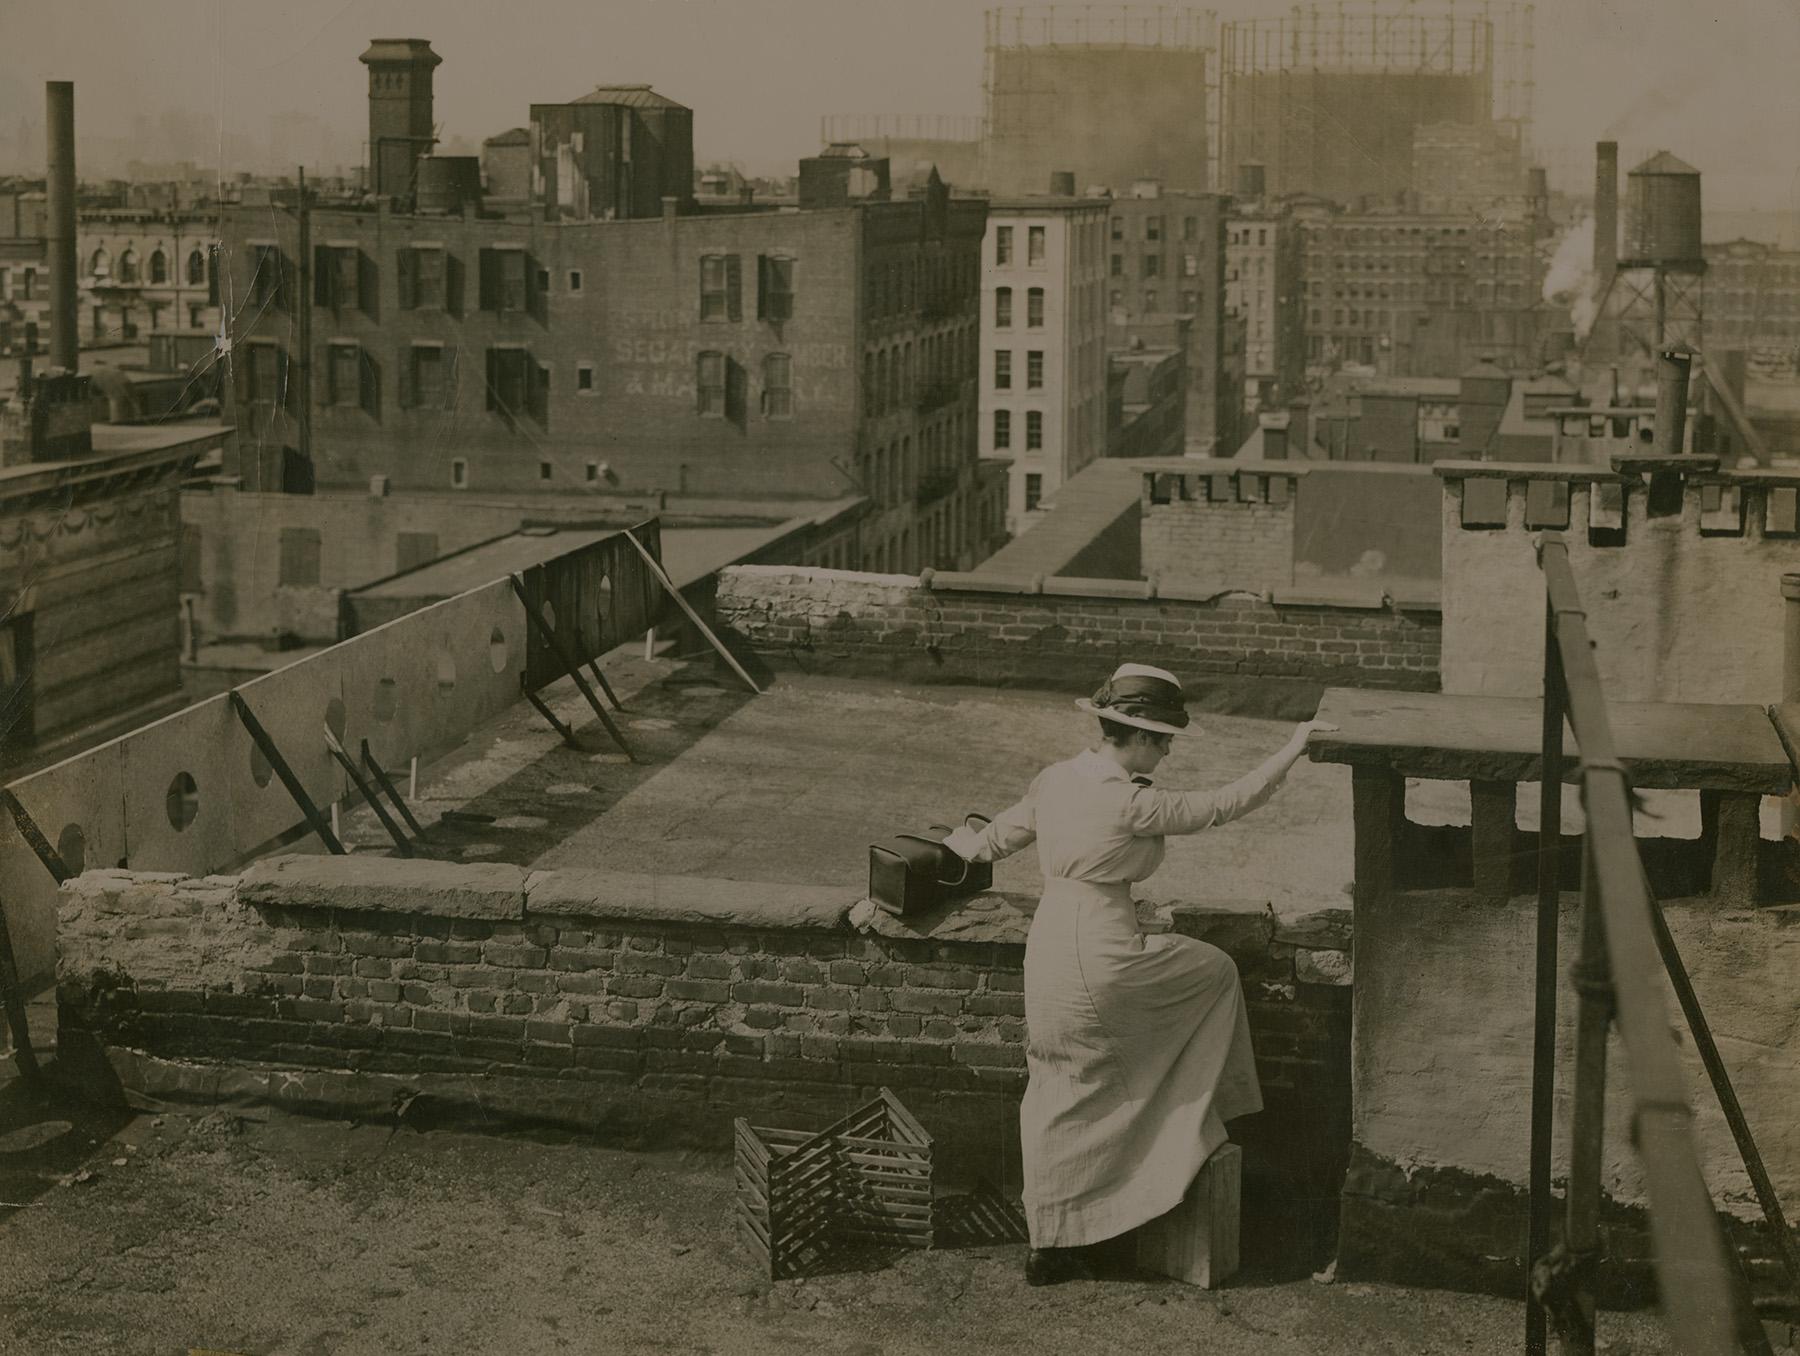 Vintage photo of nurse on rooftop, 1890s-1900s